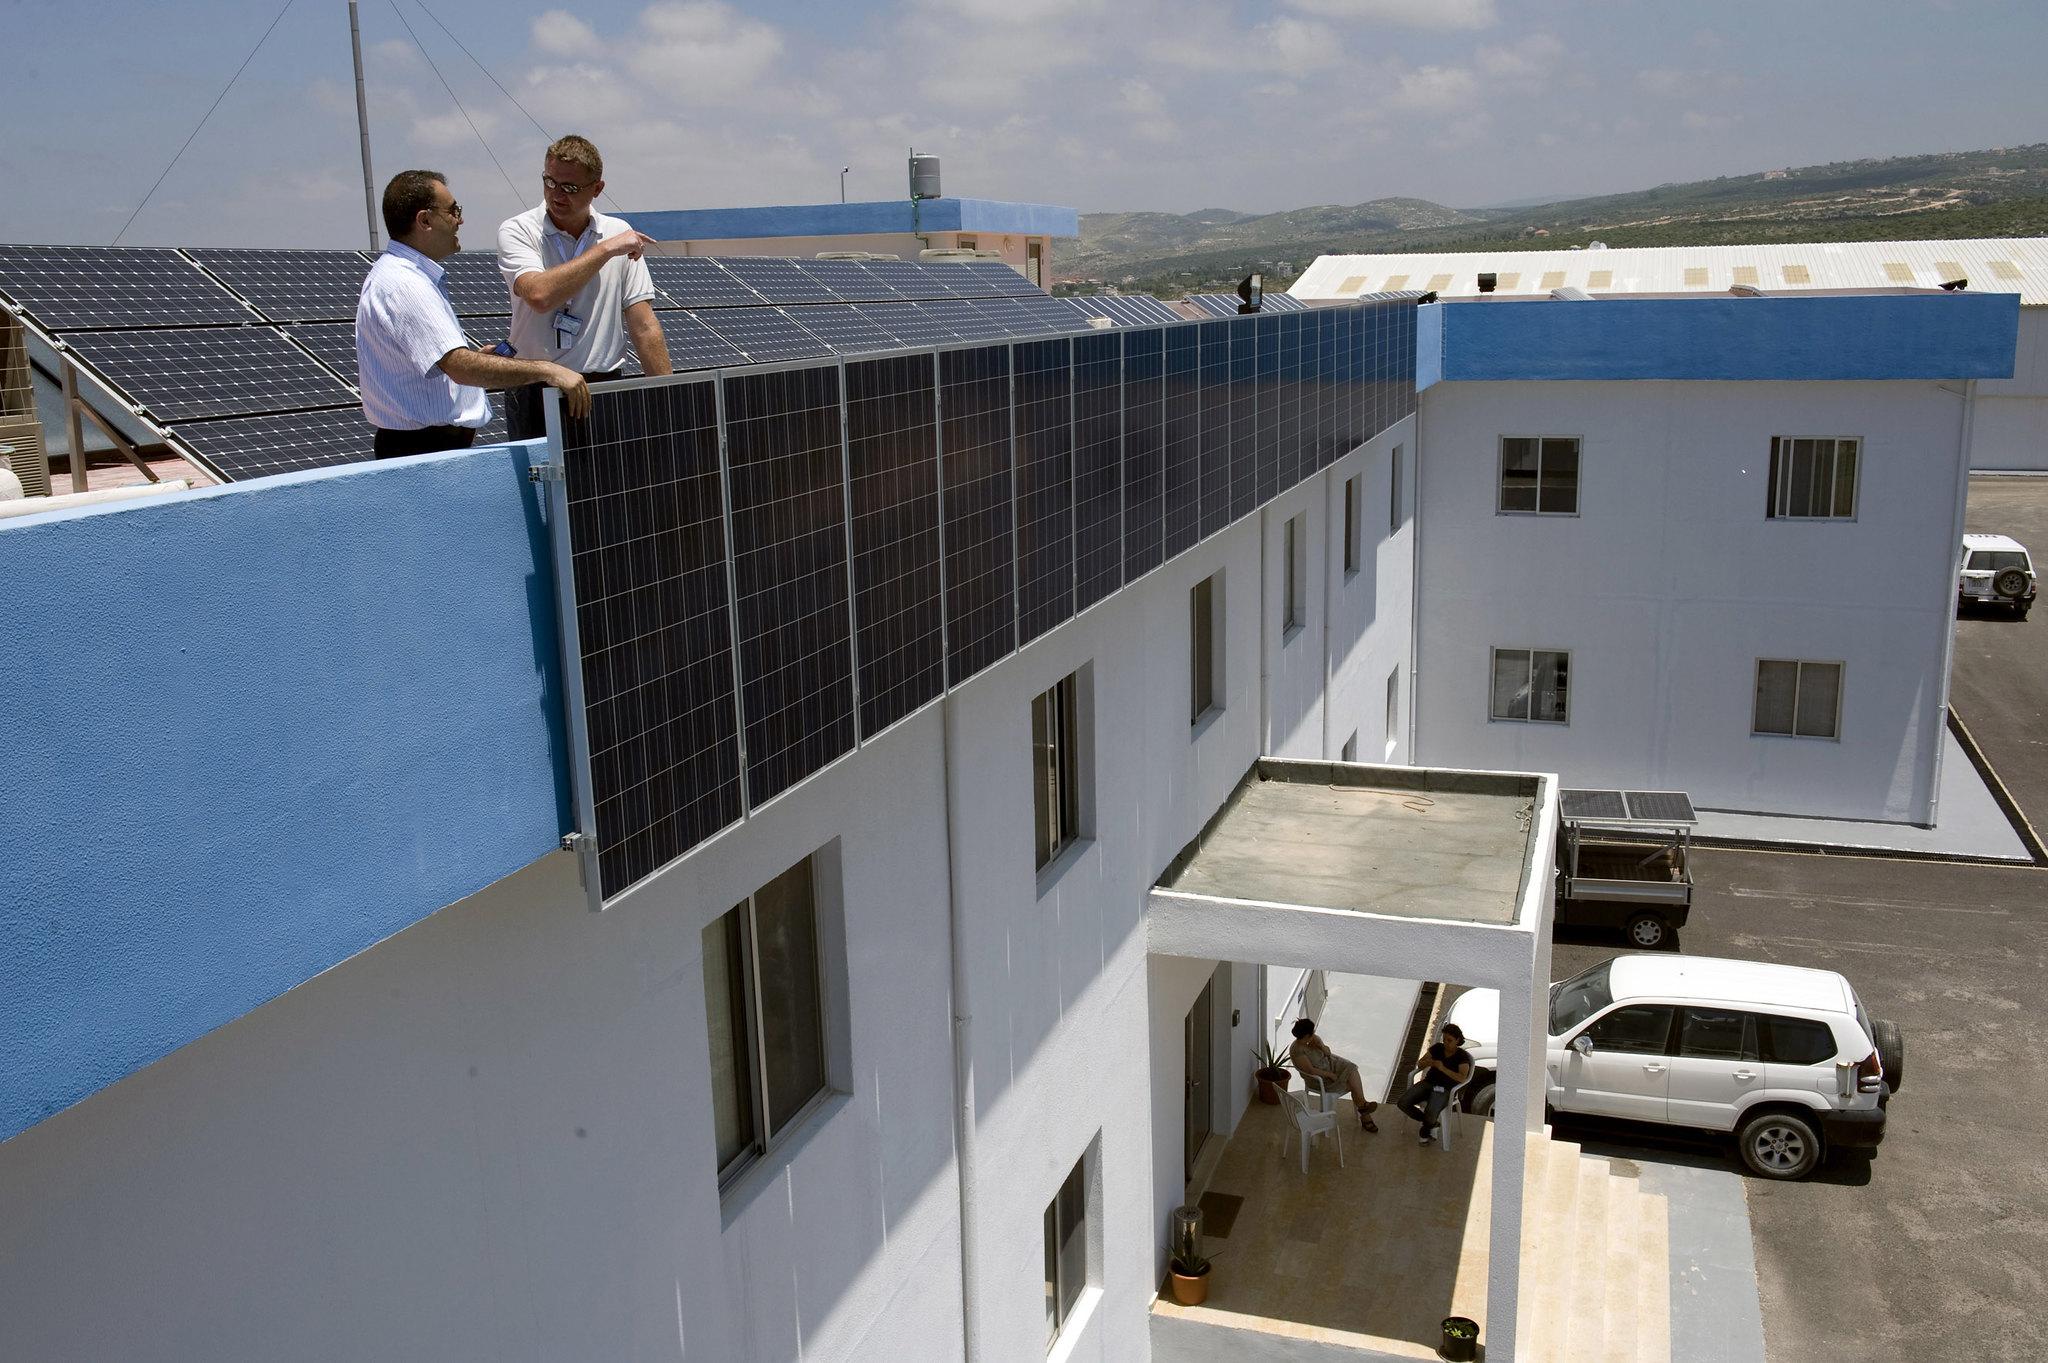 Solar panels at the UNIFIL Headquarters in Naqoura, Lebanon. Photo credit: Pasqual Gorriz/ UNIFIL.